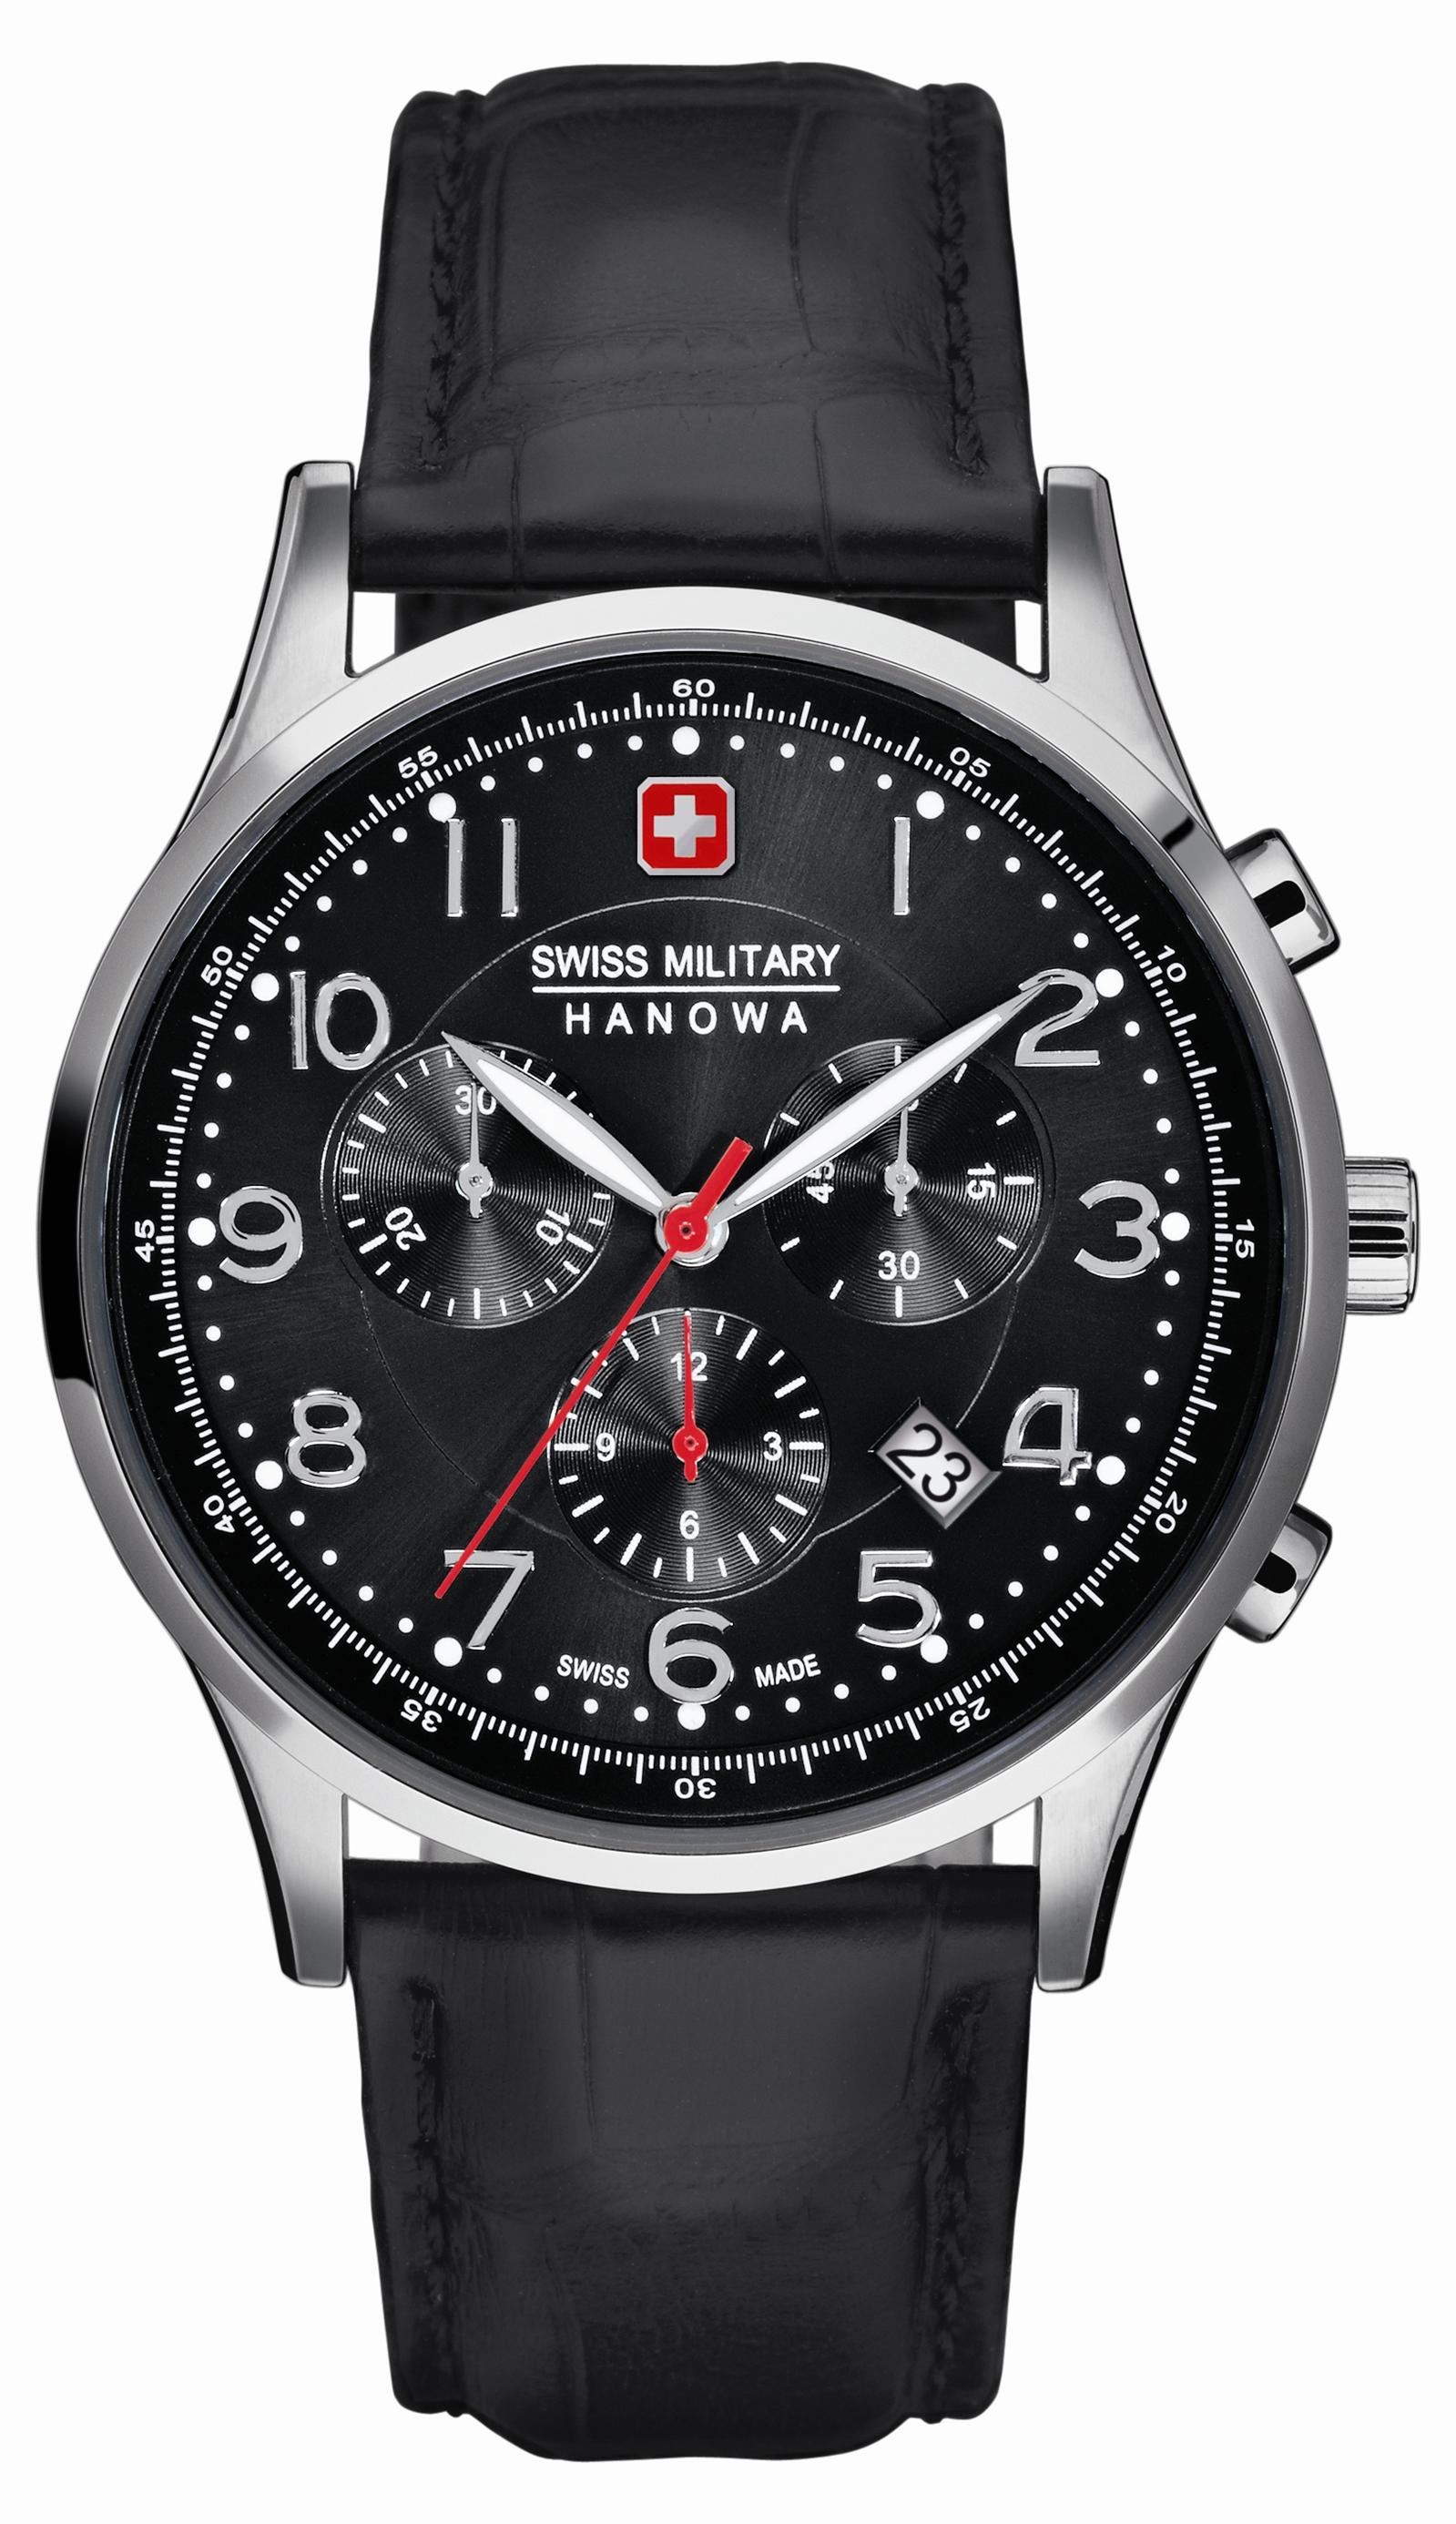 Swiss Military Hanowa Watch Battery Wroc Awski